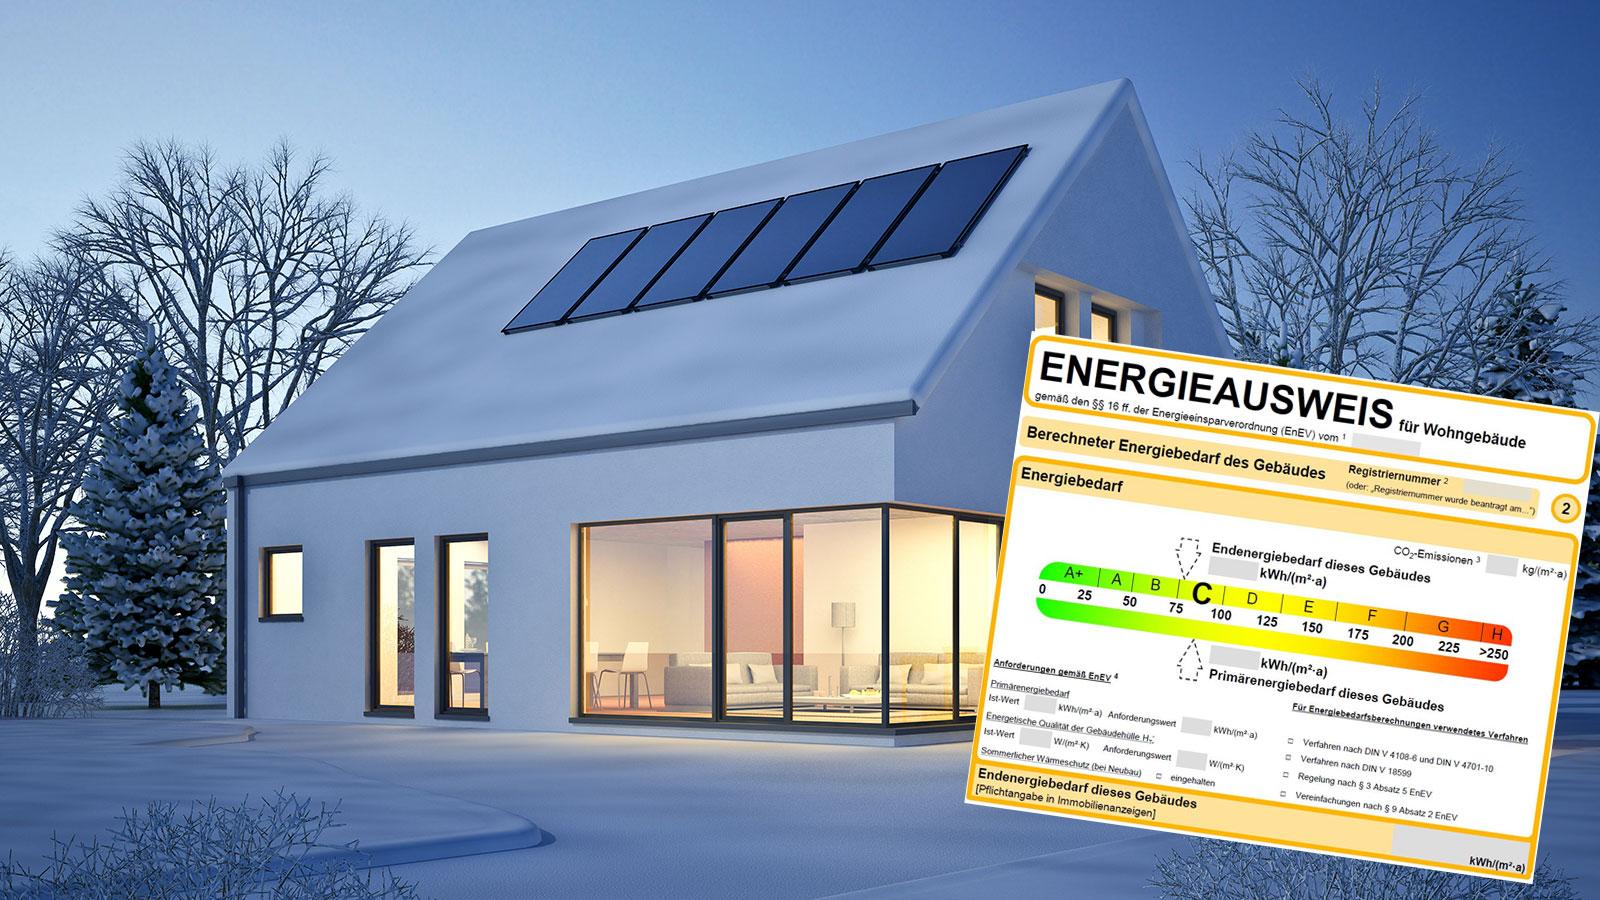 Energieberatung nach EnEV